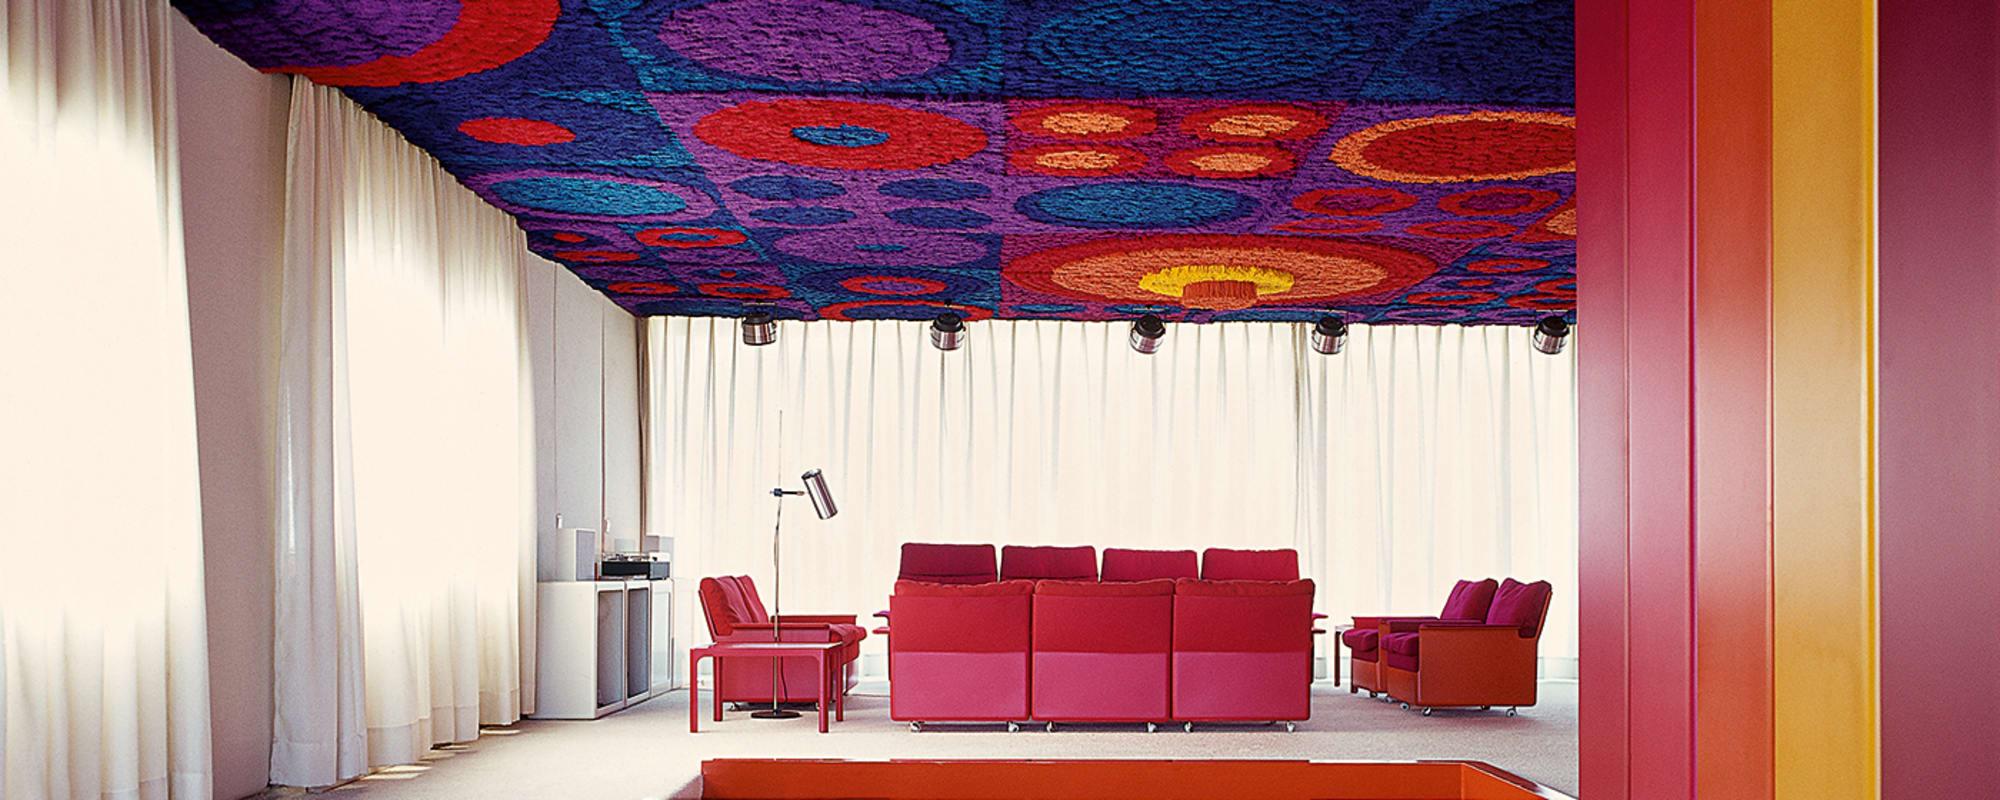 Wolfgang Feierbach, FG Design Wolfgang Feierbach Company, Kunststoff, Plastik, Wohnzimmer, Polster, Möbel